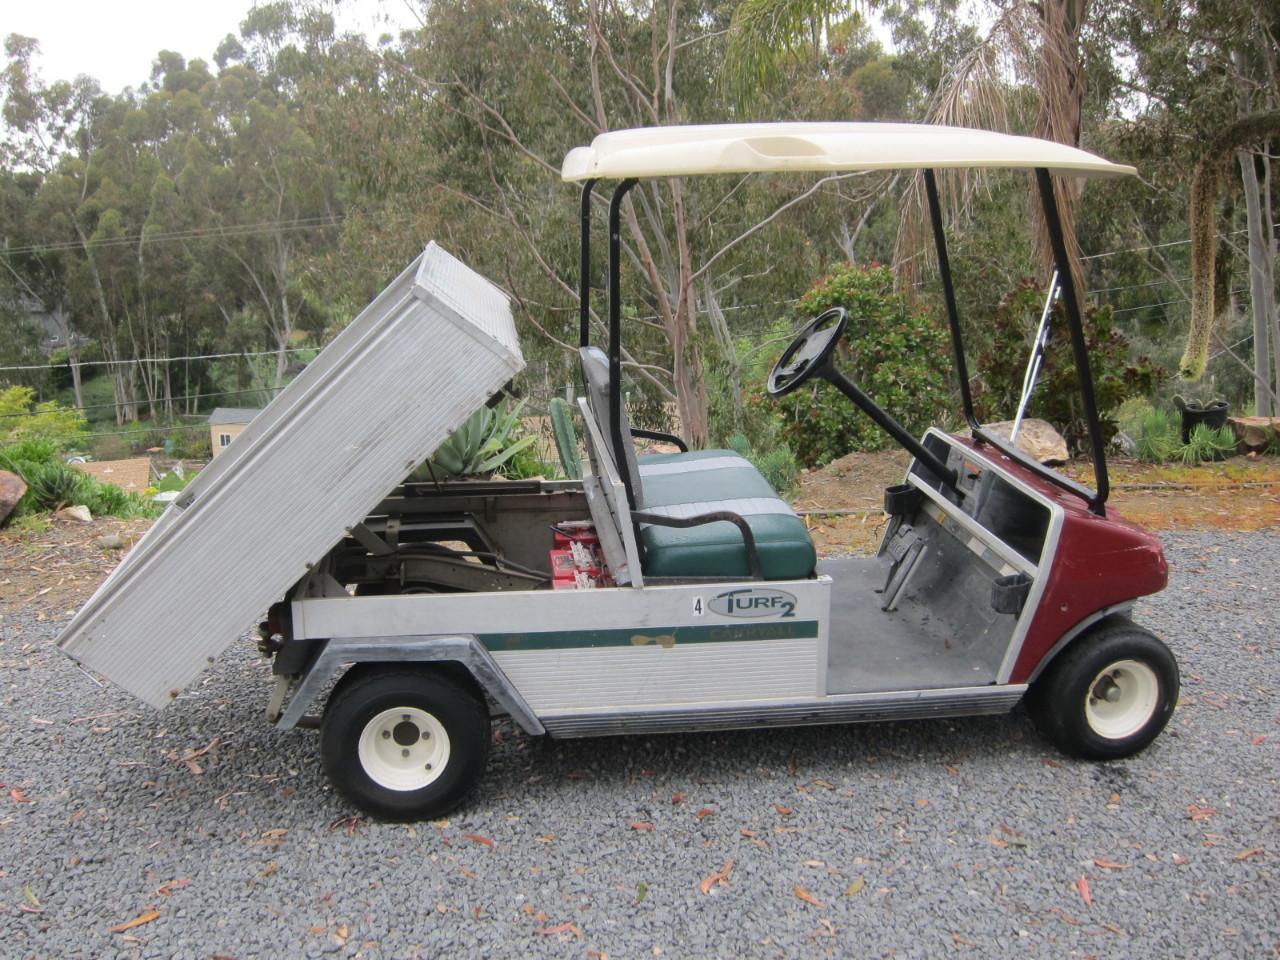 Diagram Also Yamaha G1 Golf Cart Wiring Diagram On Club Car Golf Cart